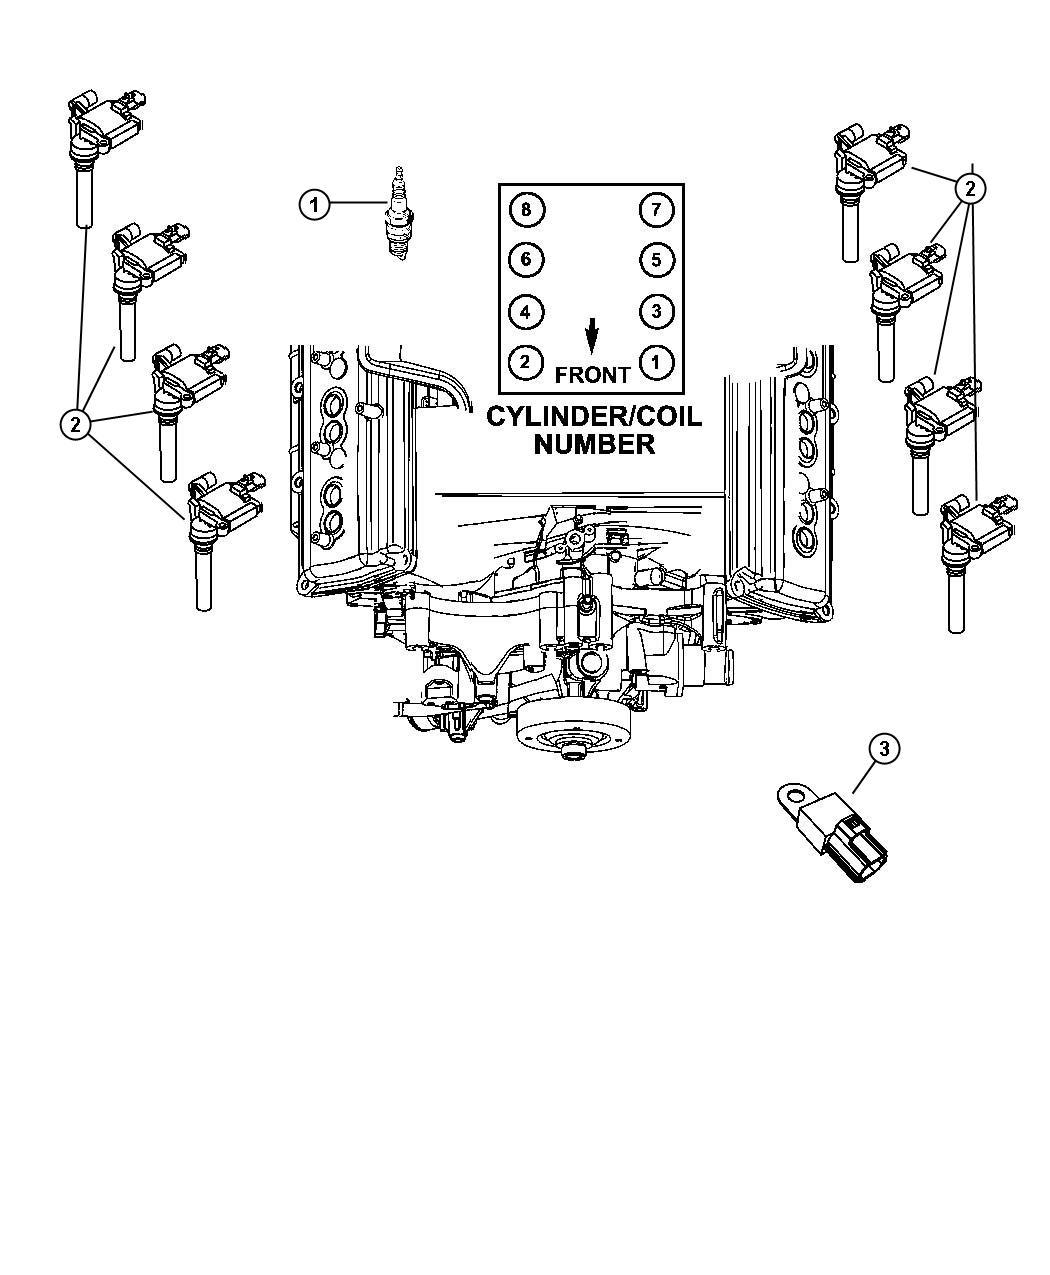 Chrysler Aspen Spark Plug Ignition Plugs Group